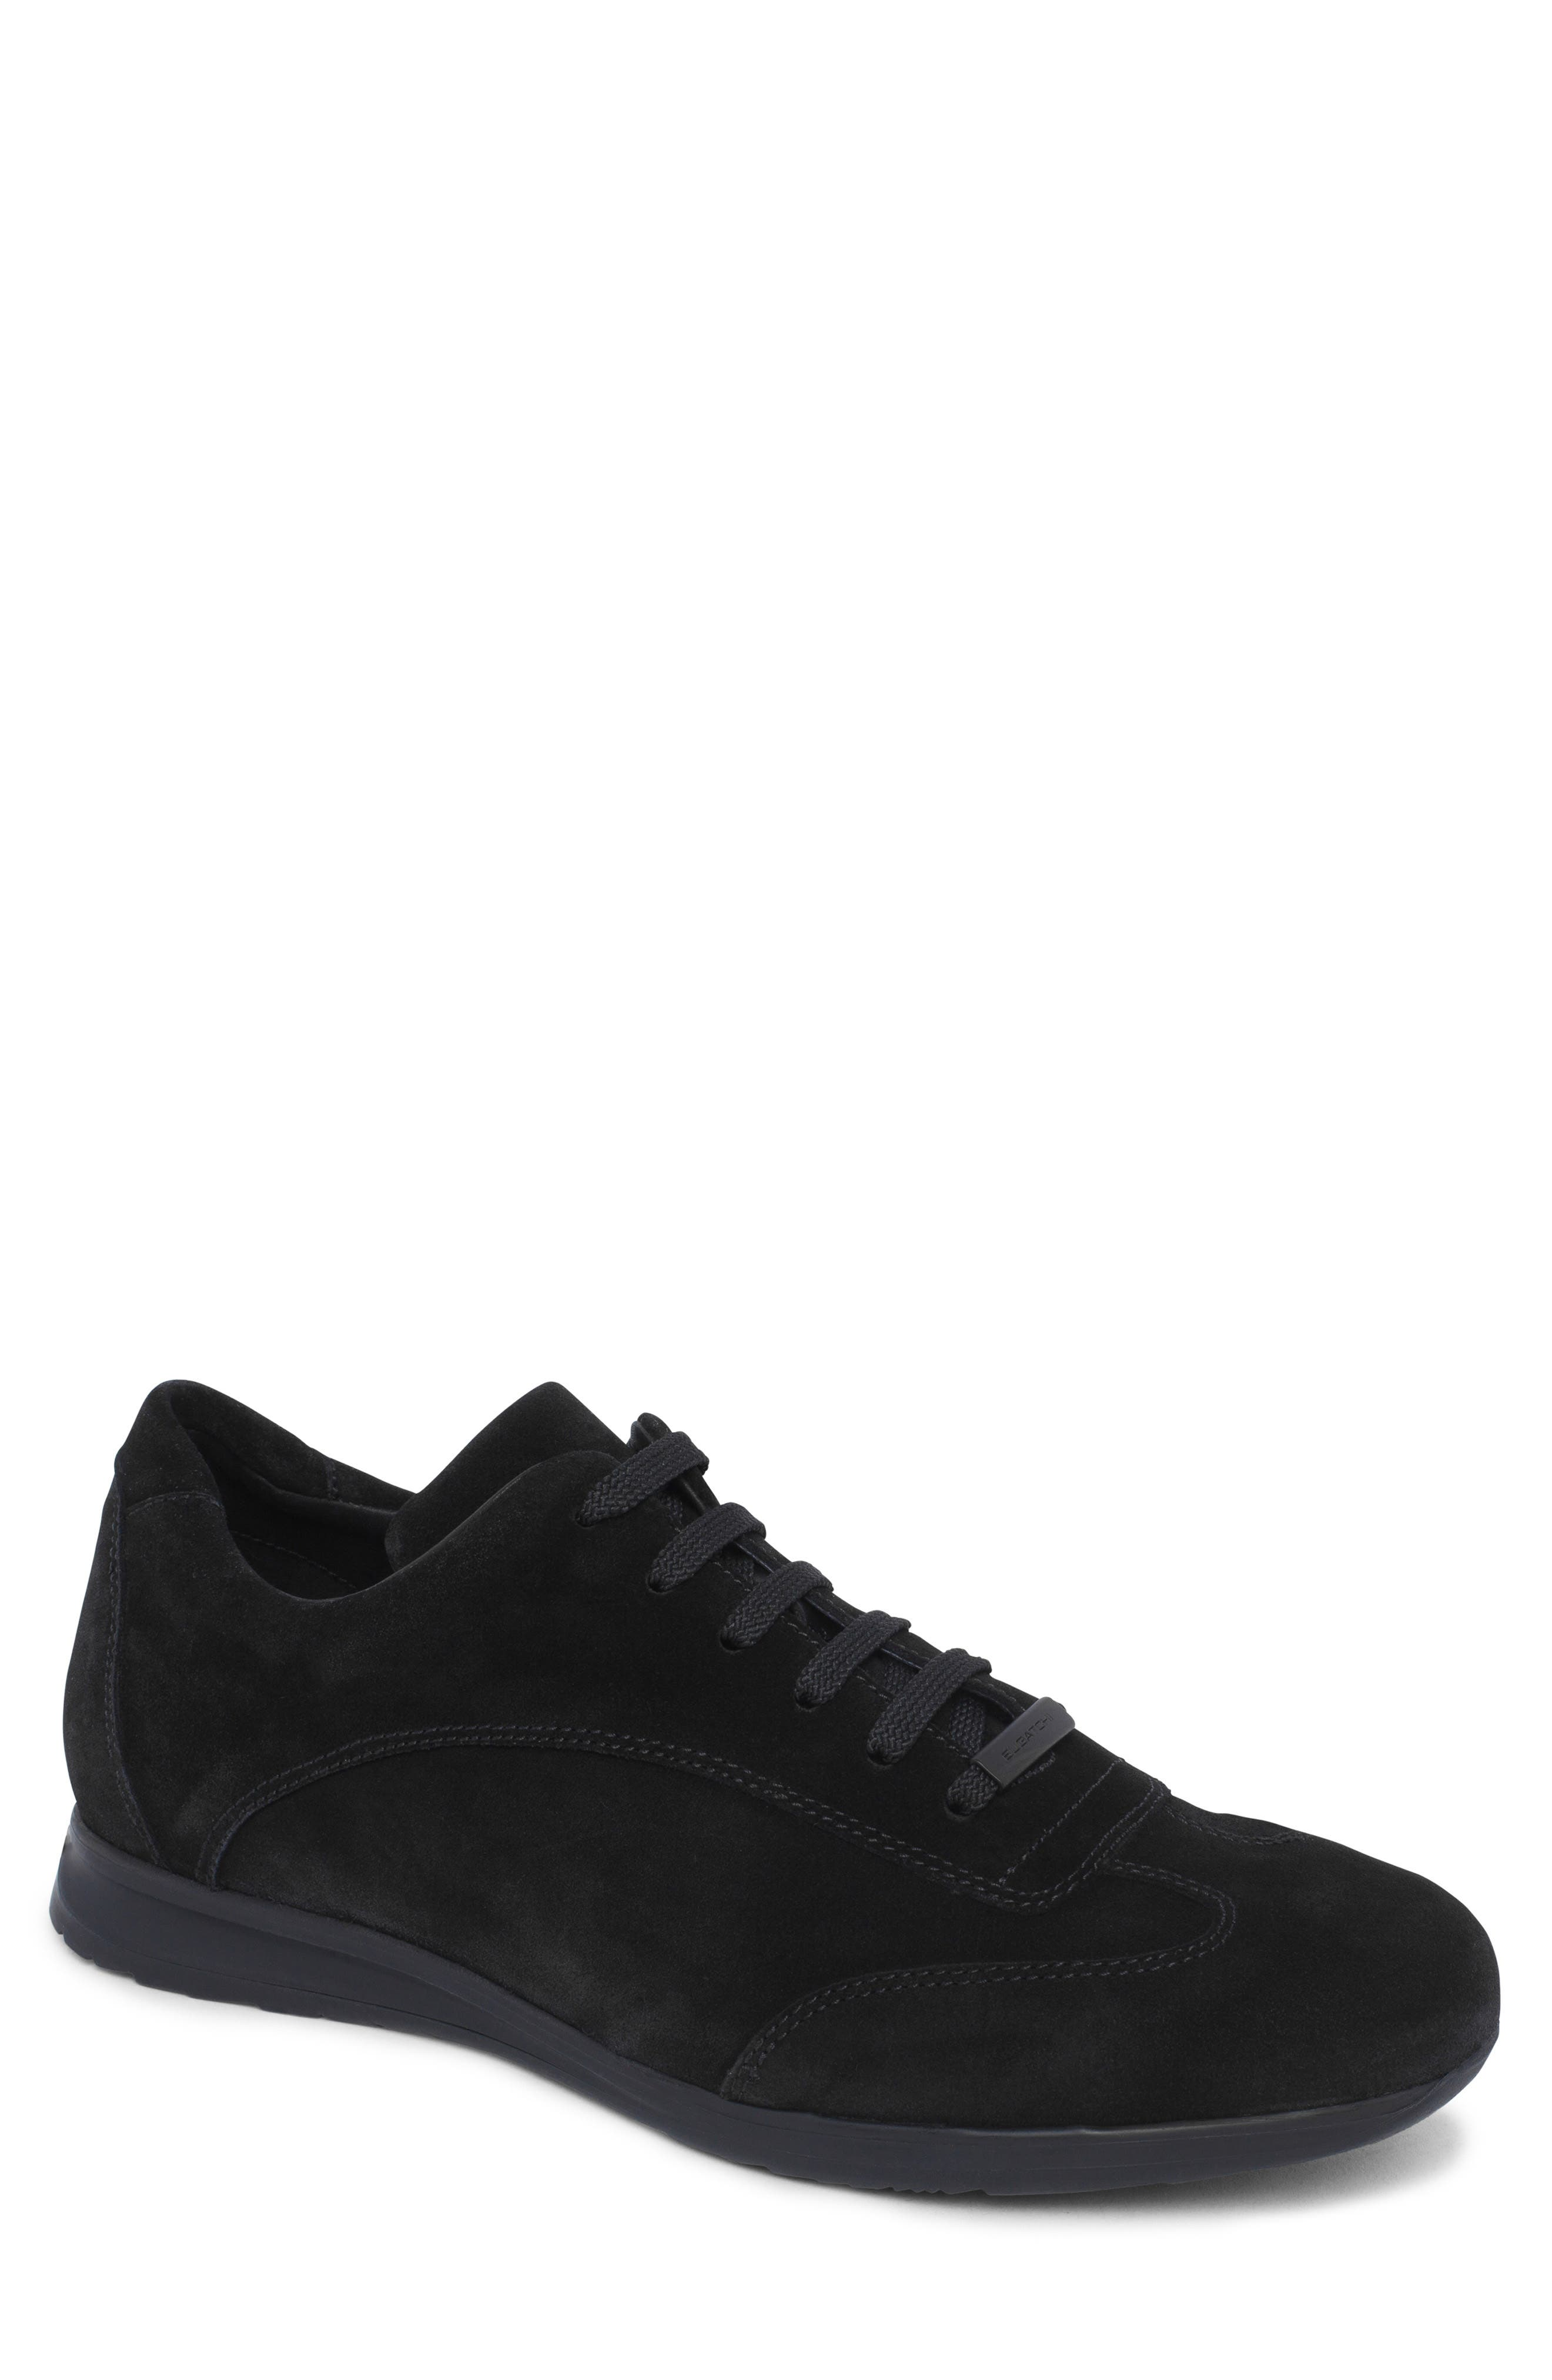 Monte Rosso Sneaker,                             Main thumbnail 1, color,                             NERO